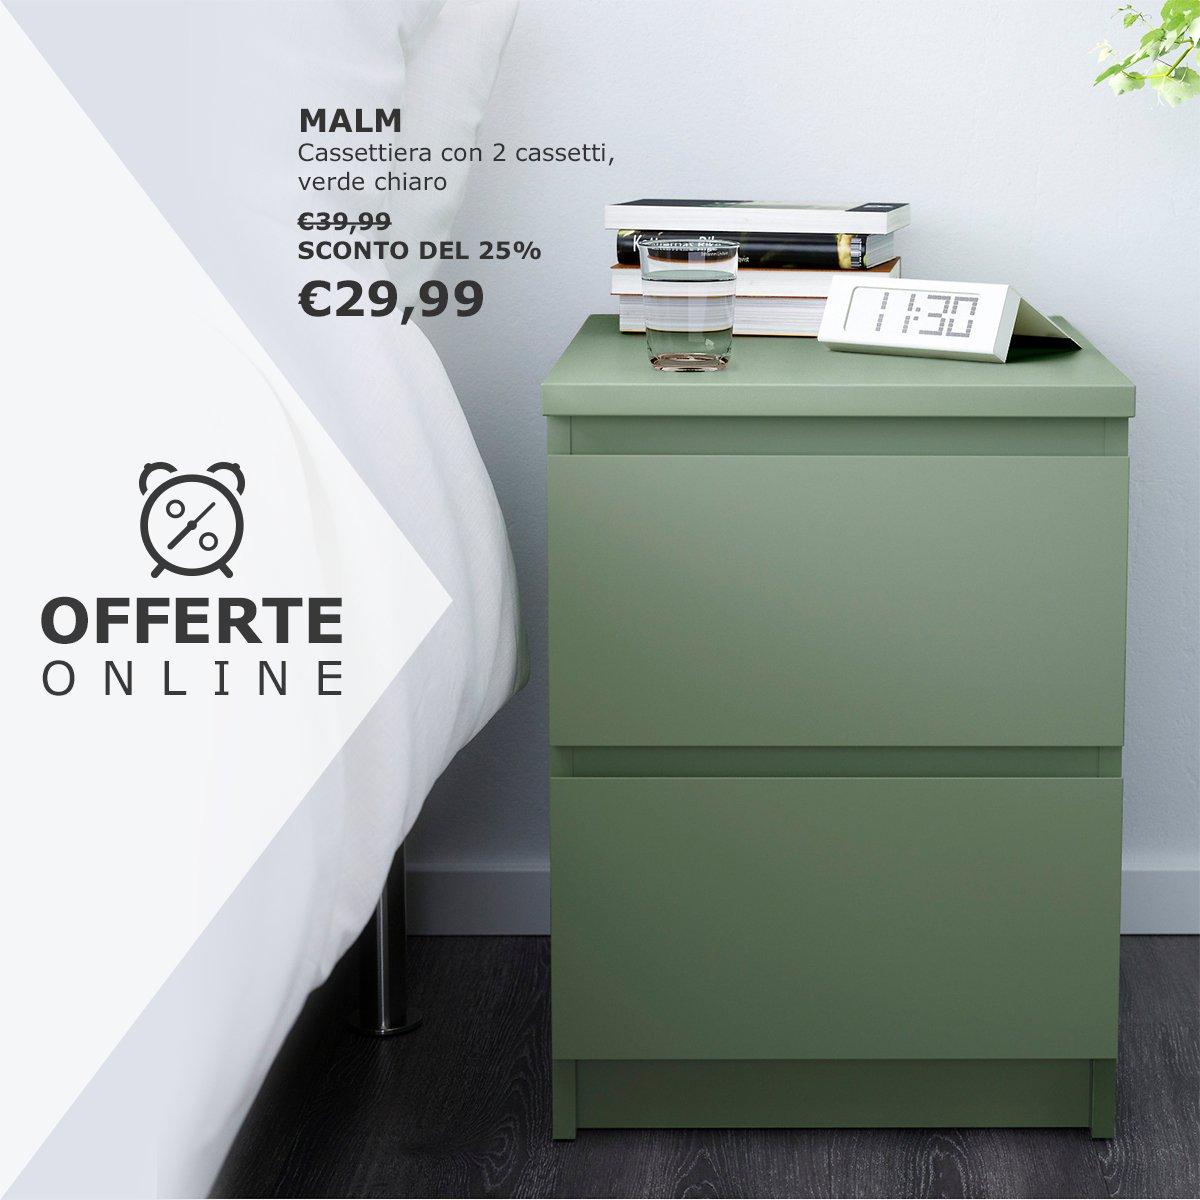 Malm Cassettiera 2 Cassetti Ikea.Giuliano Lupini Giuliano Wolf Twitter